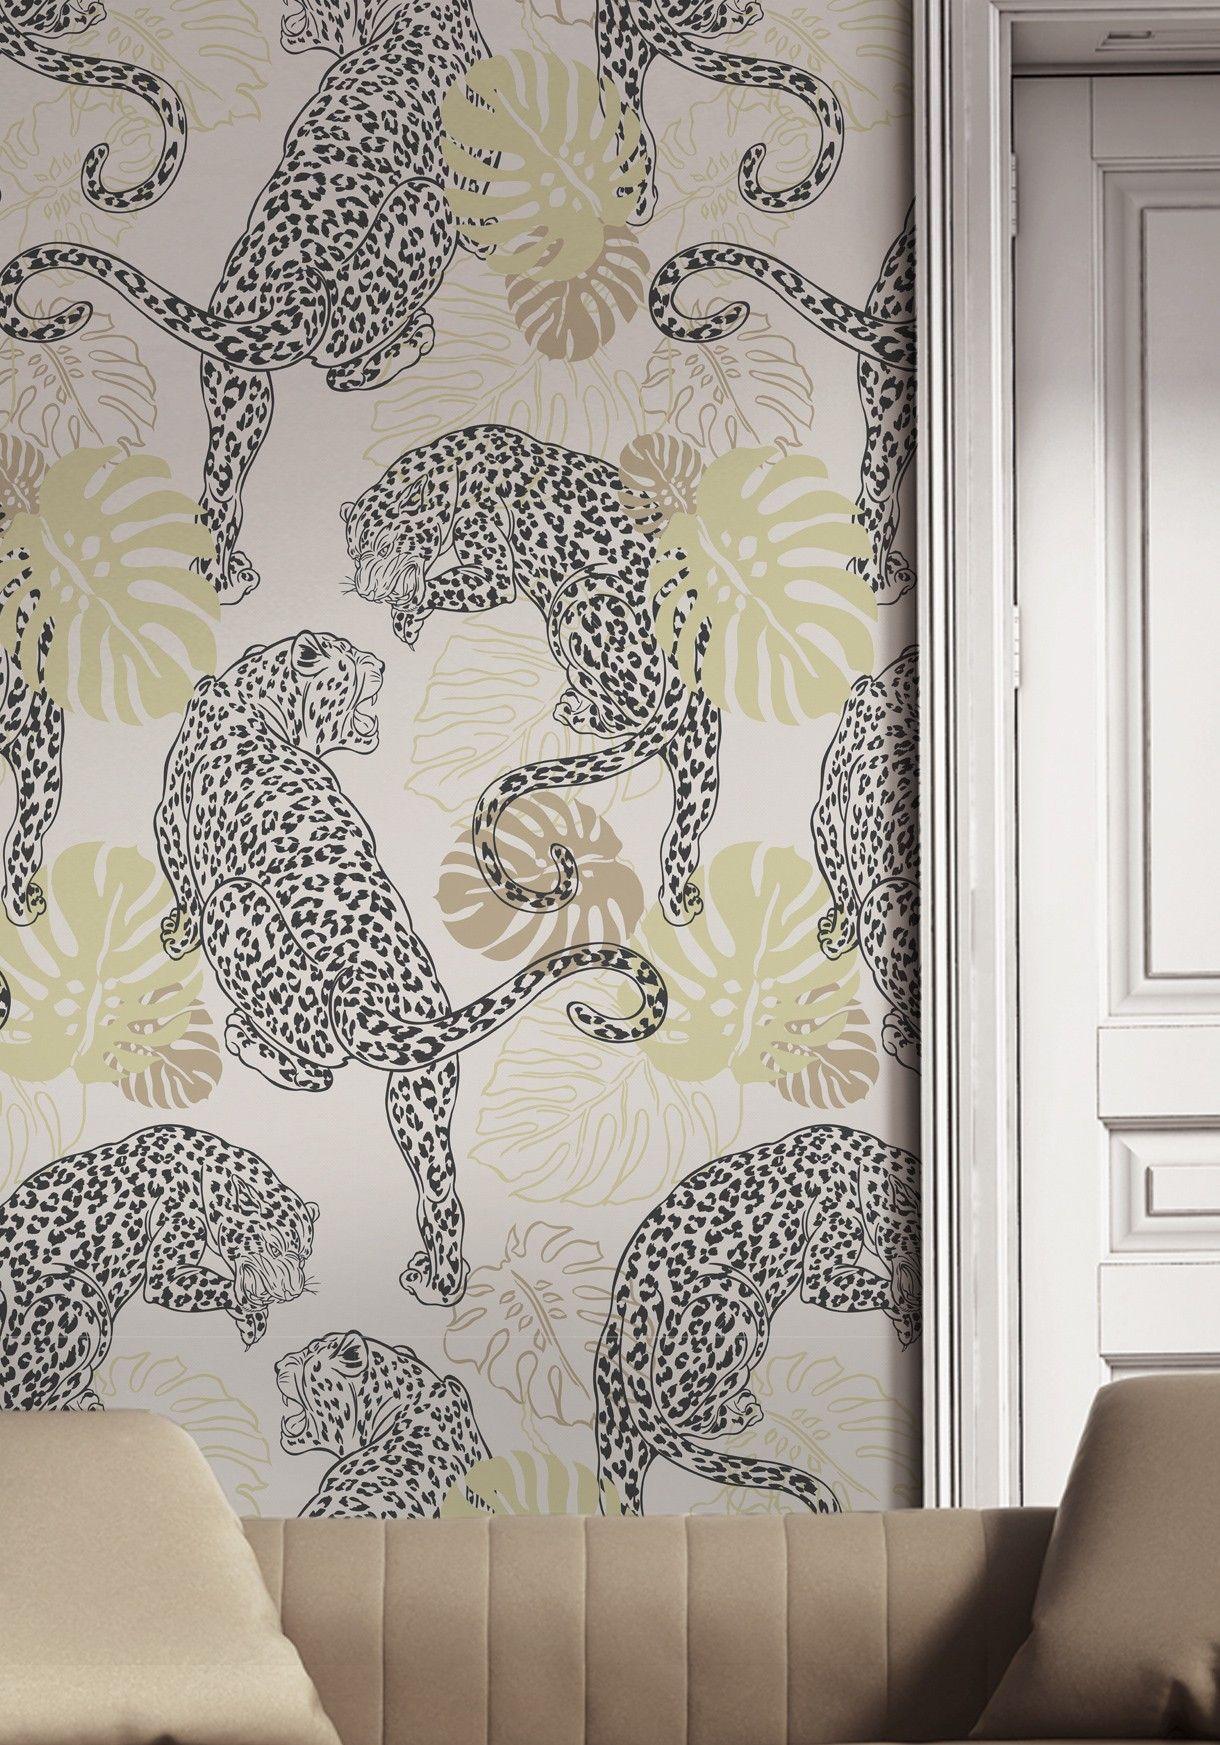 Leopard Stunning Art Deco Inspired Wallpaper In 2019 Art